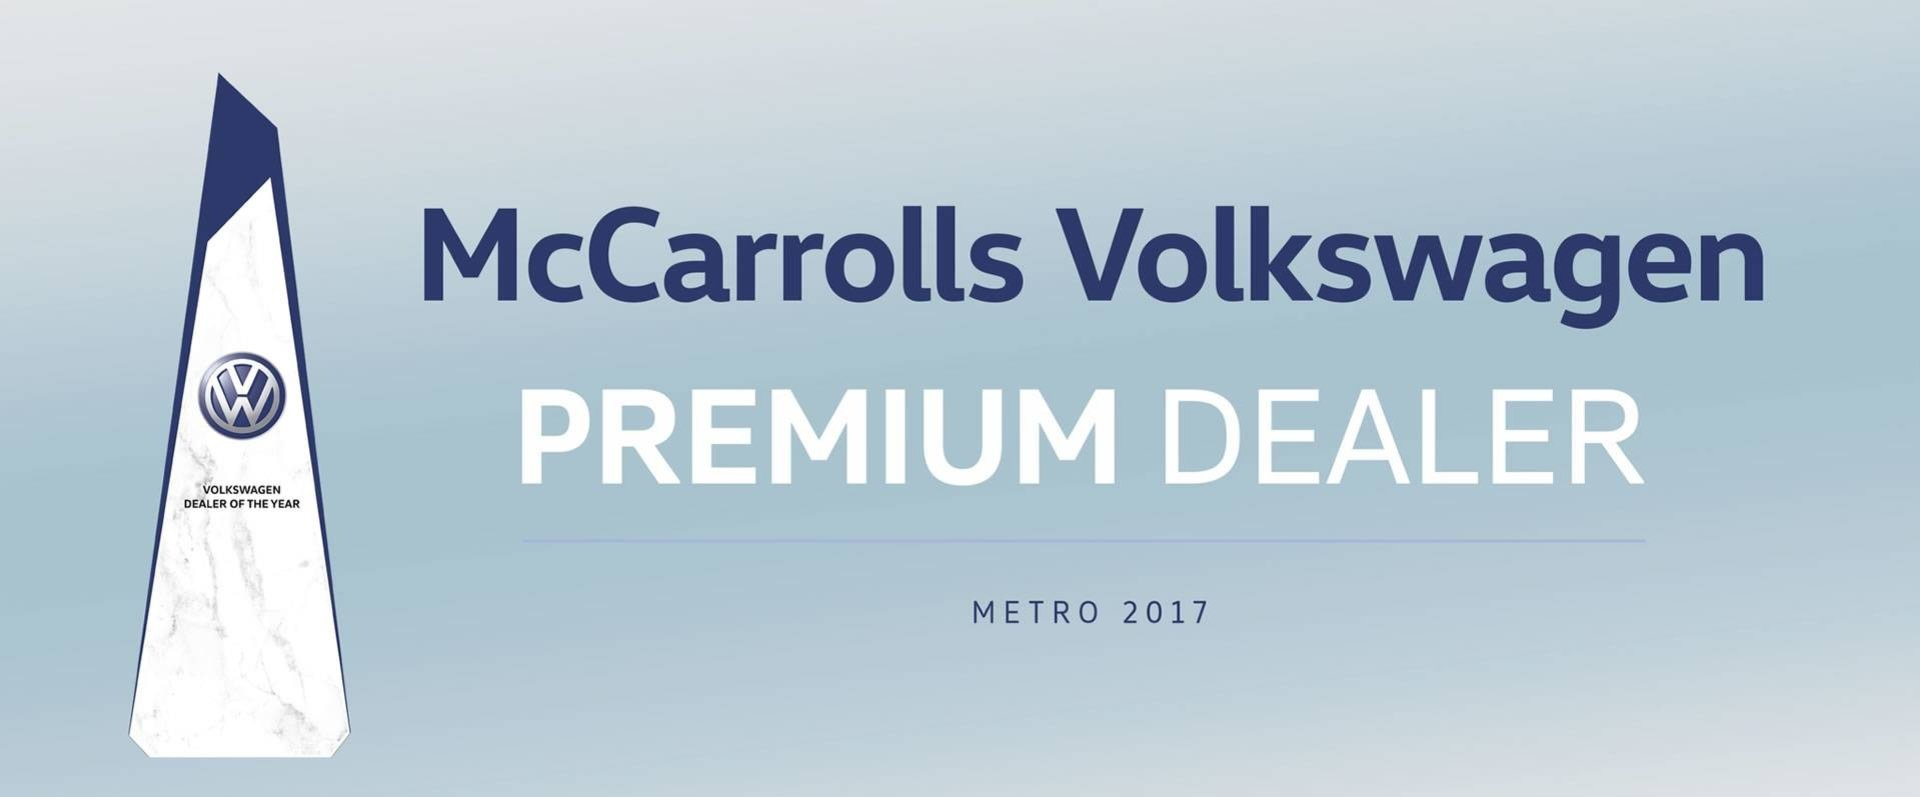 McCarrolls_VW_Premium_dealer_2017